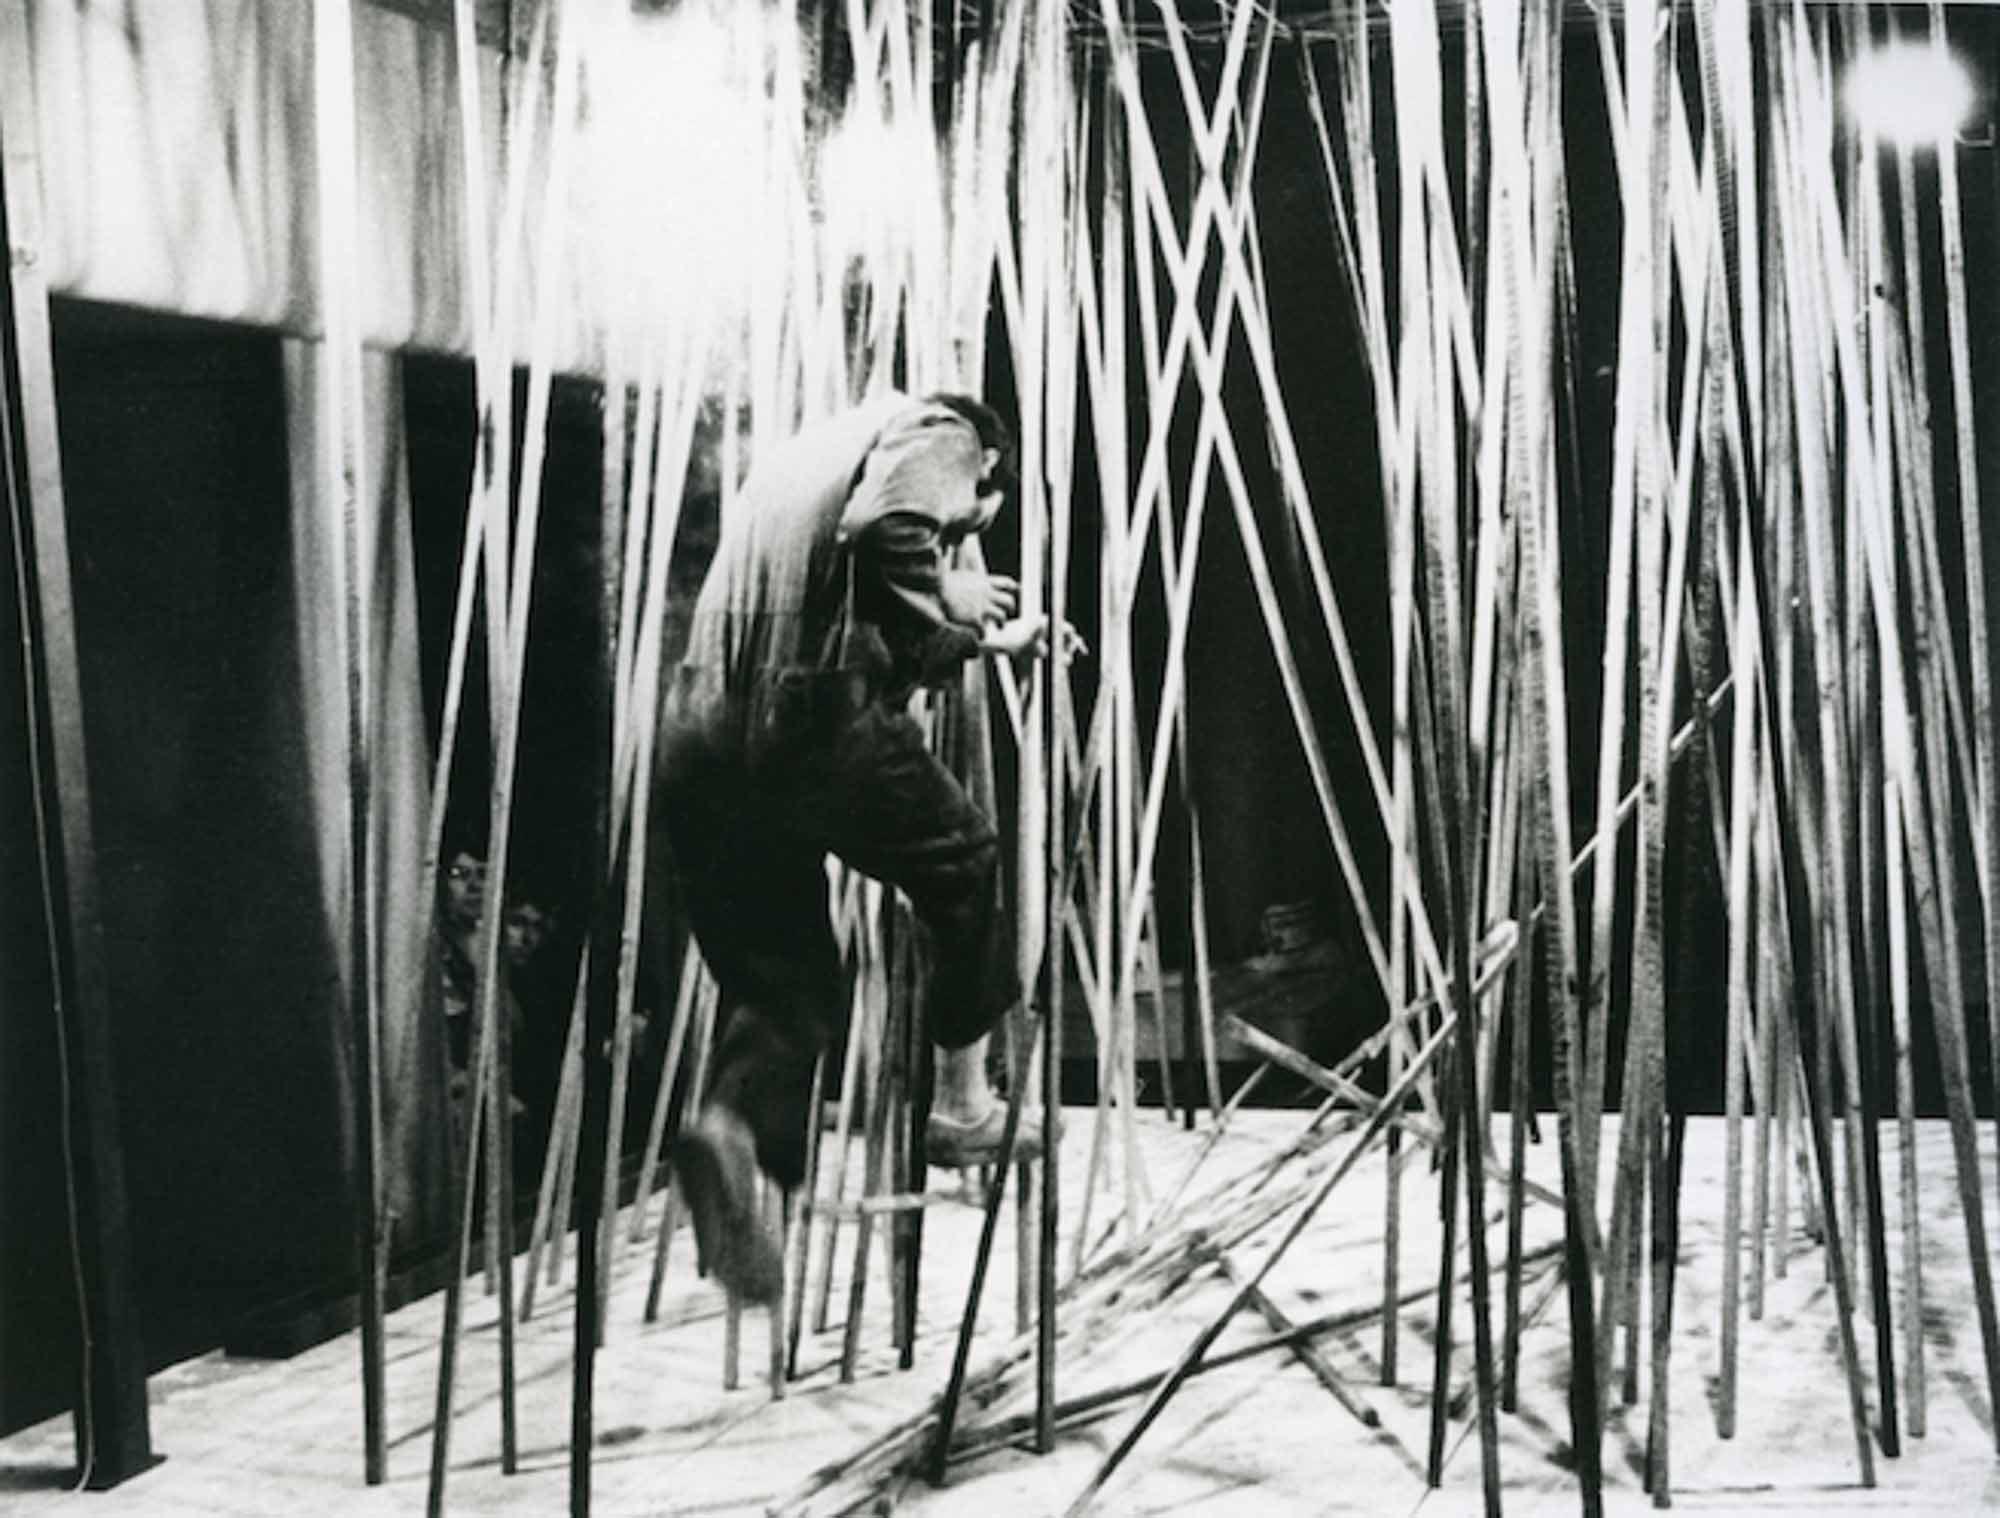 Nigel Rolfe, Running Man, (1978). Arts Council Gallery, Belfast, Northern Ireland.